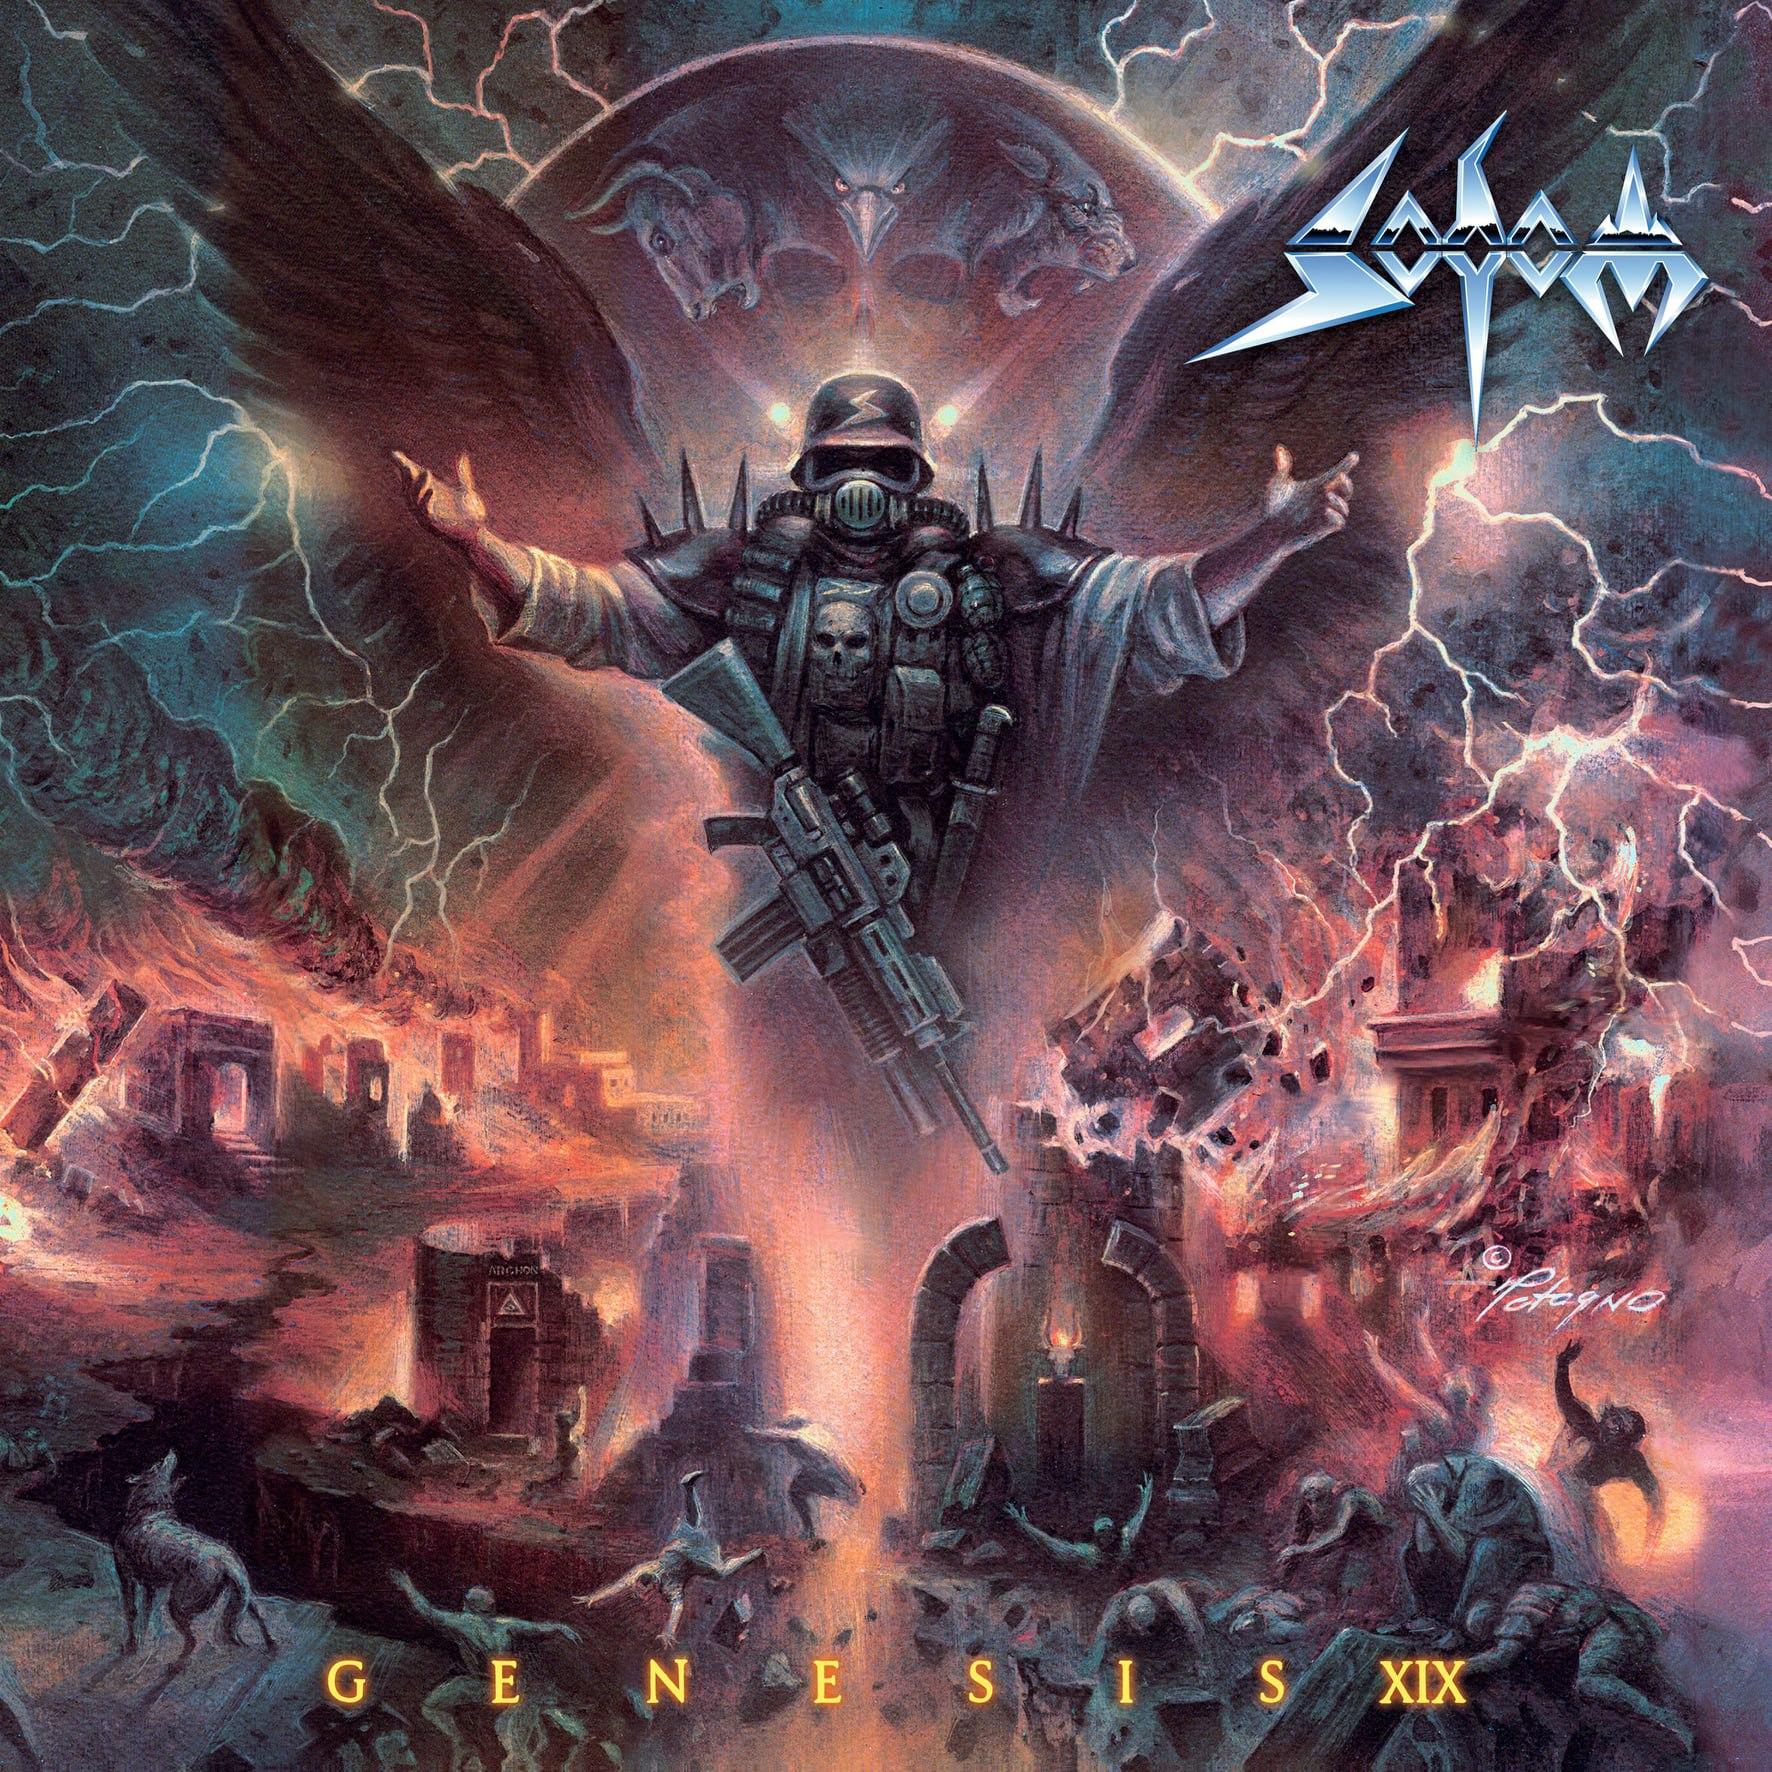 Sodom - Genesis XIX - Cover - Moshpipassion